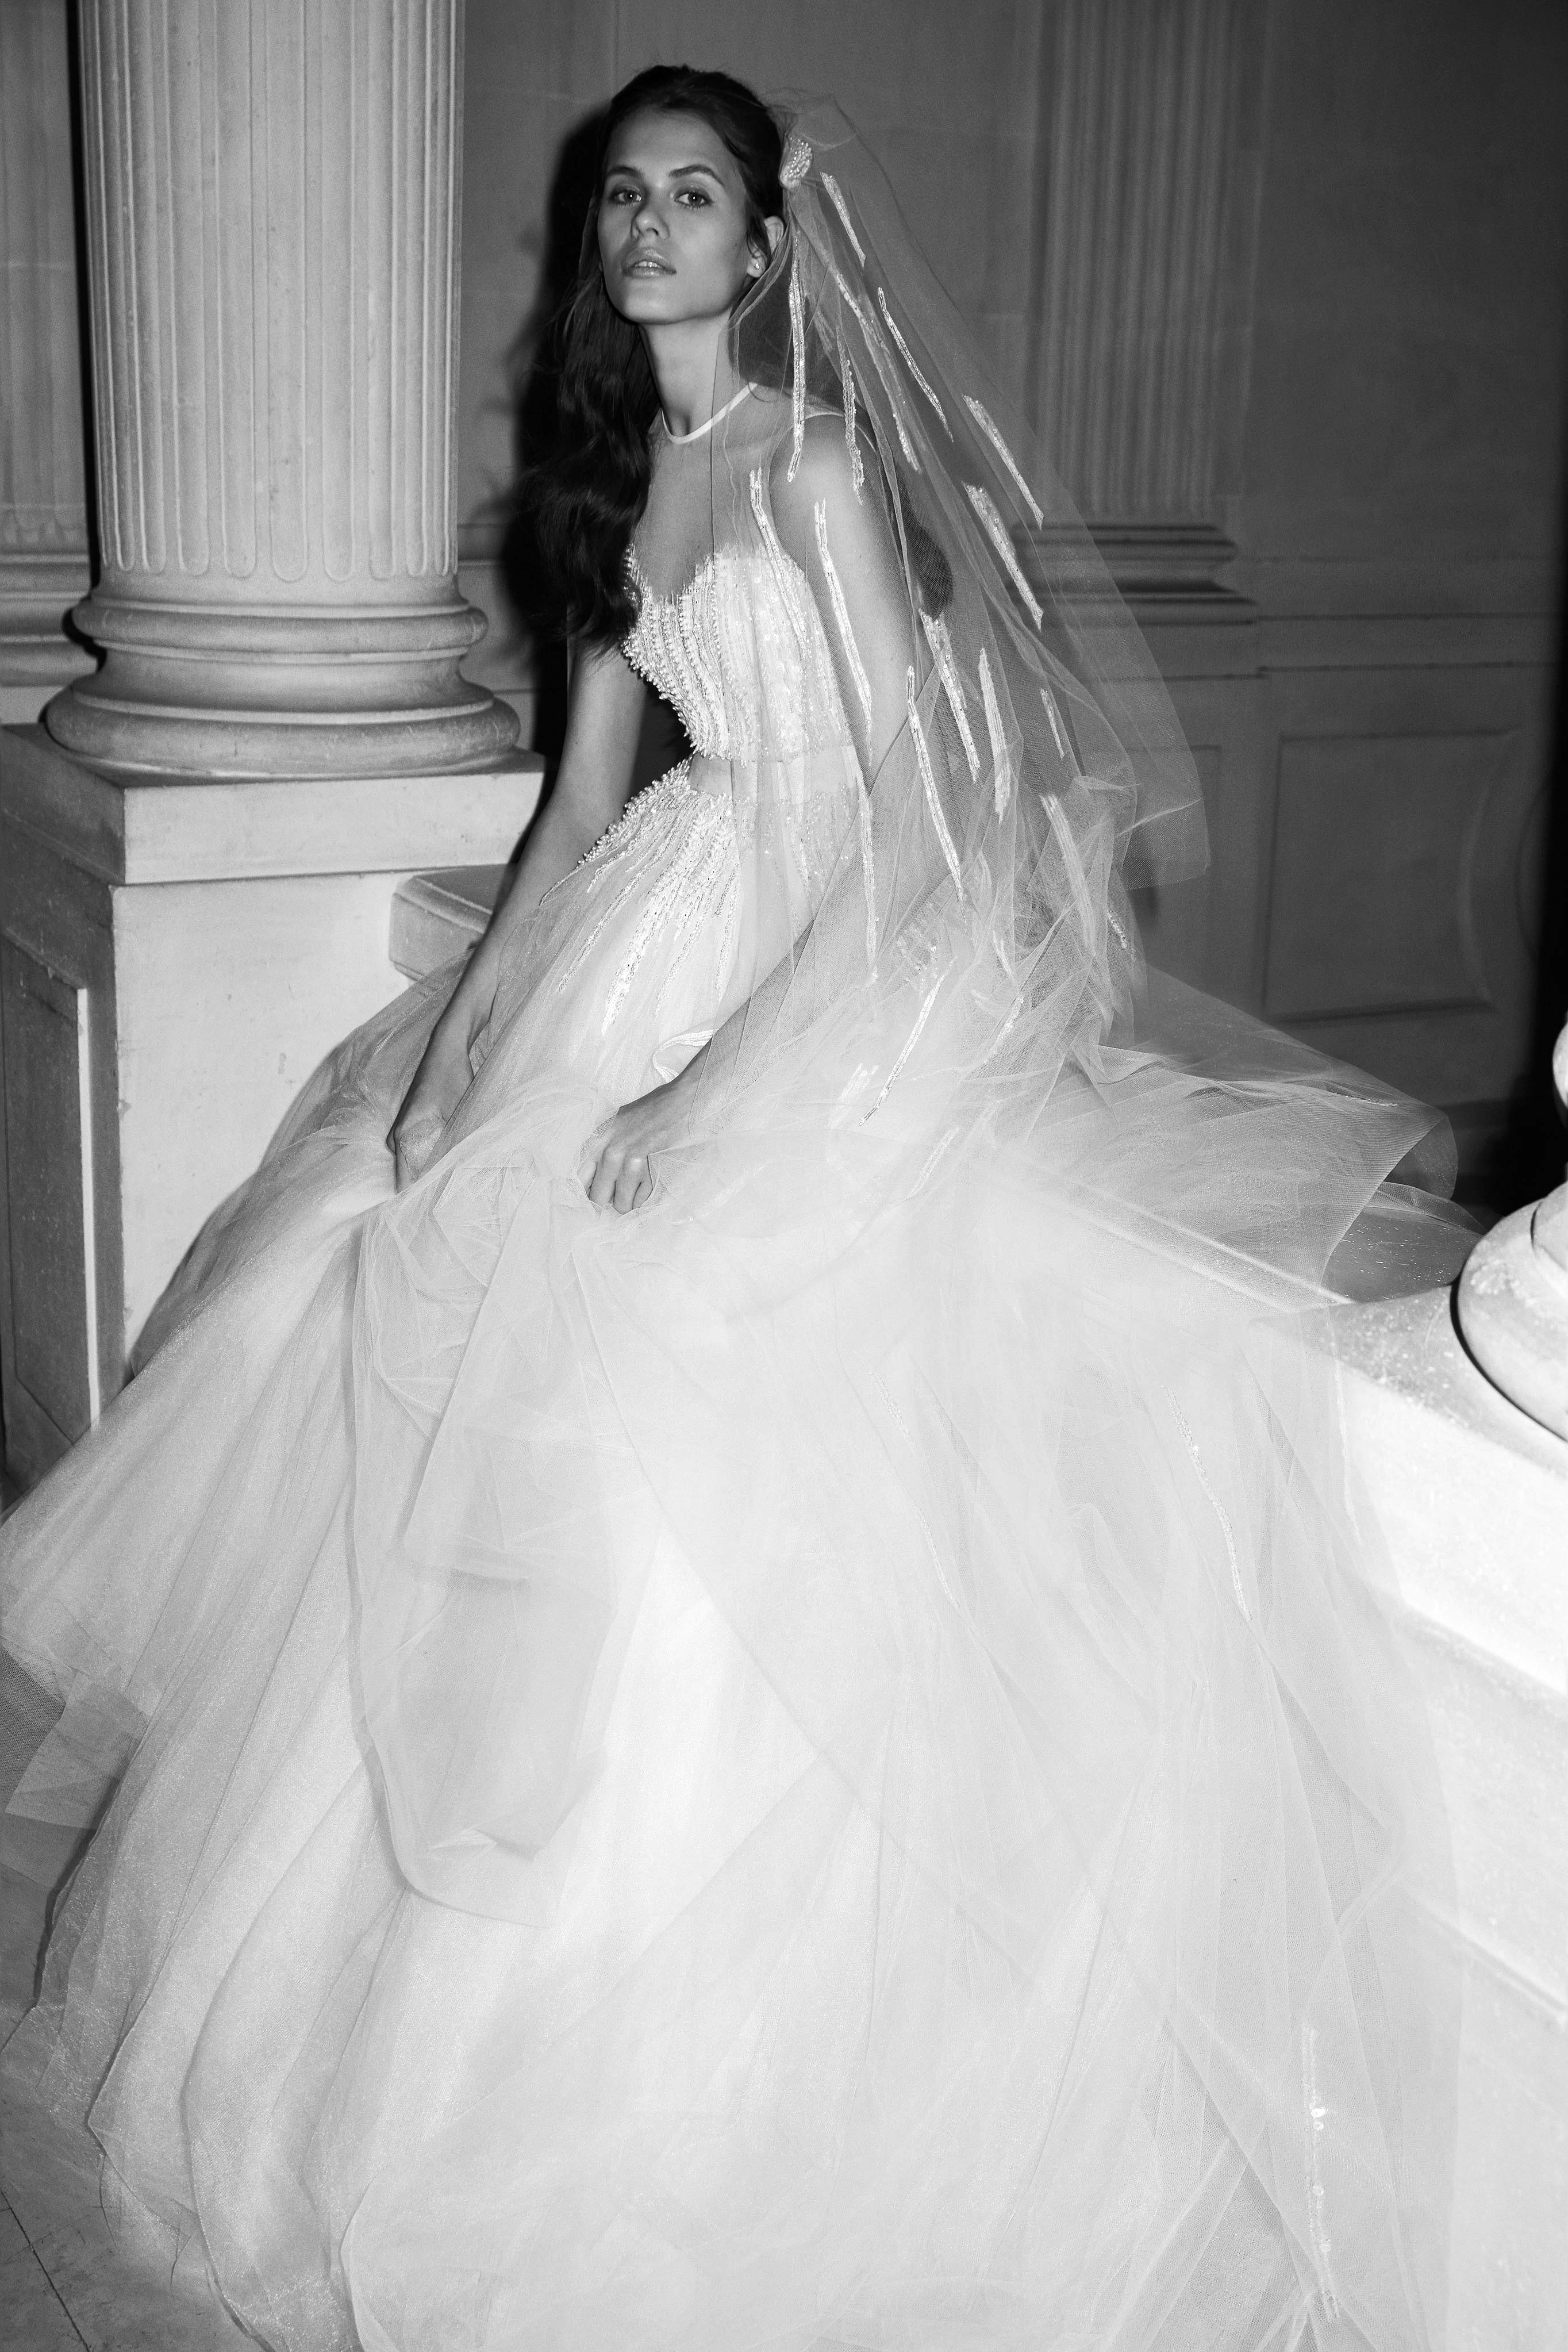 elie saab wedding dress spring 2019 ball gown tulle illusion sleeveless